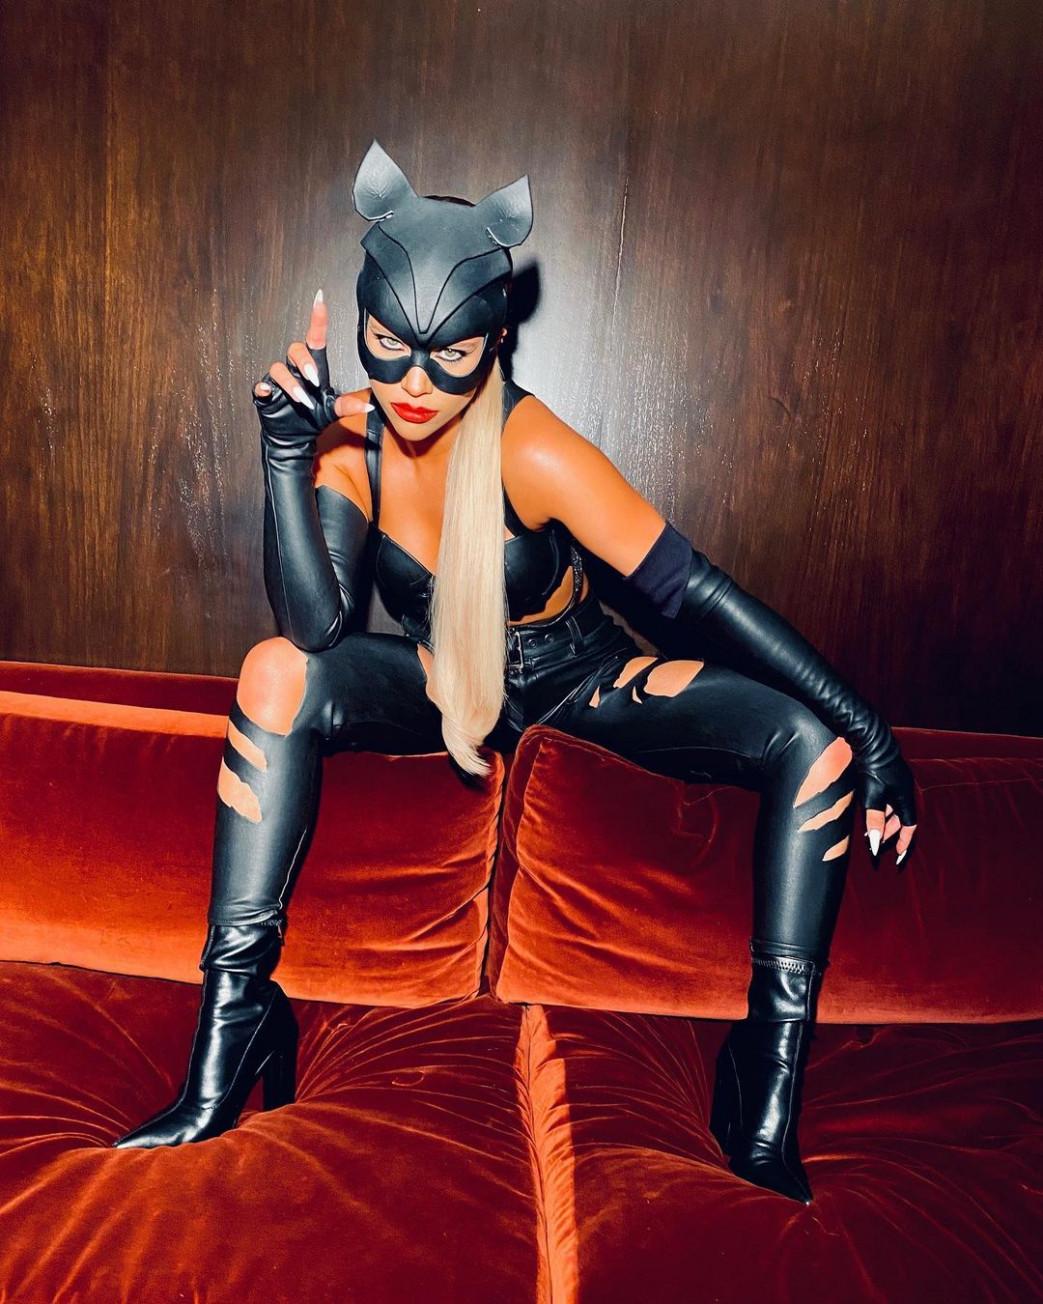 Sofia-Richie-Busty-Halloween-Costume-3.jpg